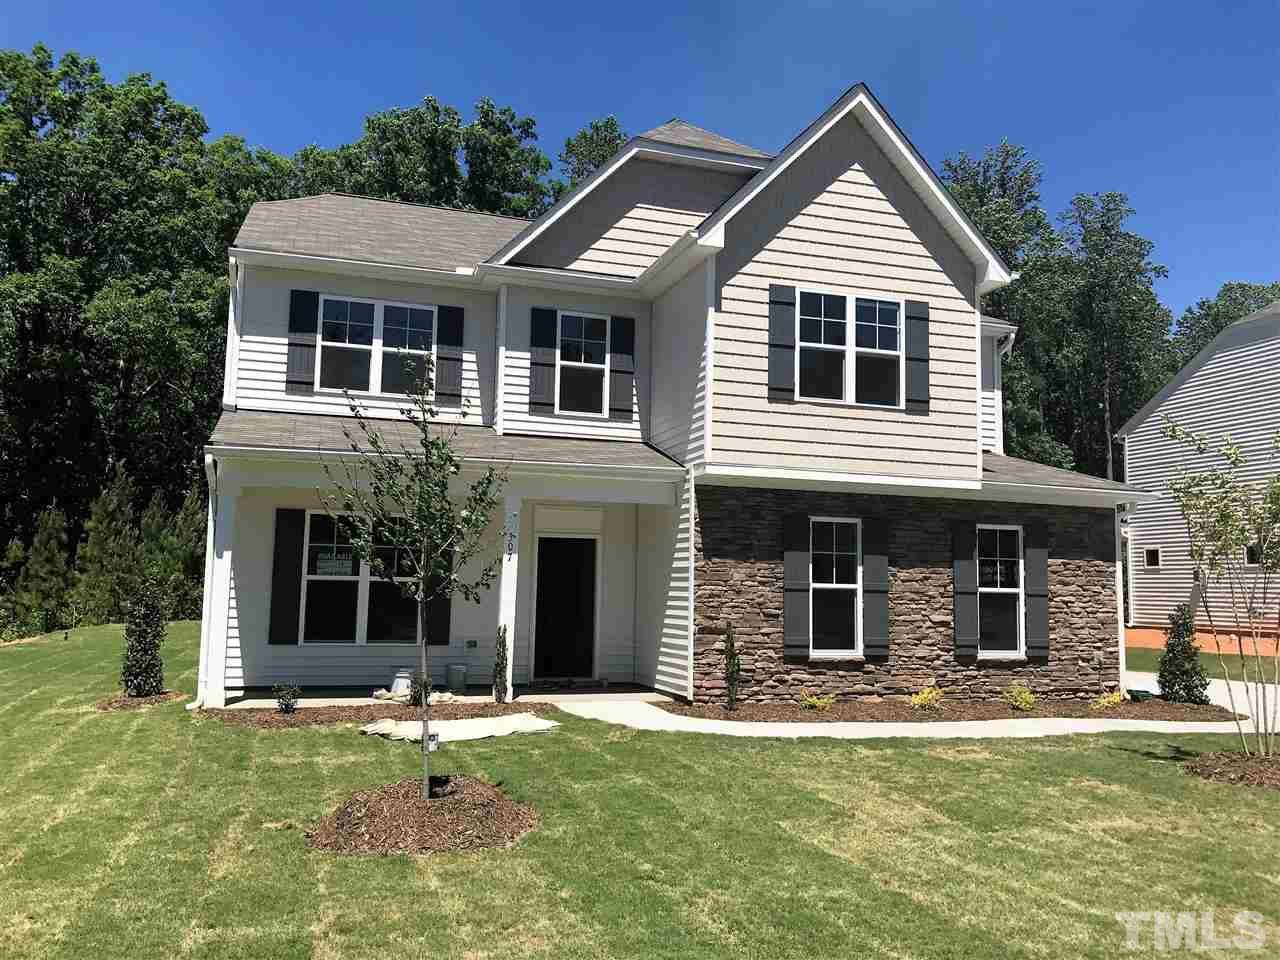 307 Siena Way 14, Clayton, NC 27527